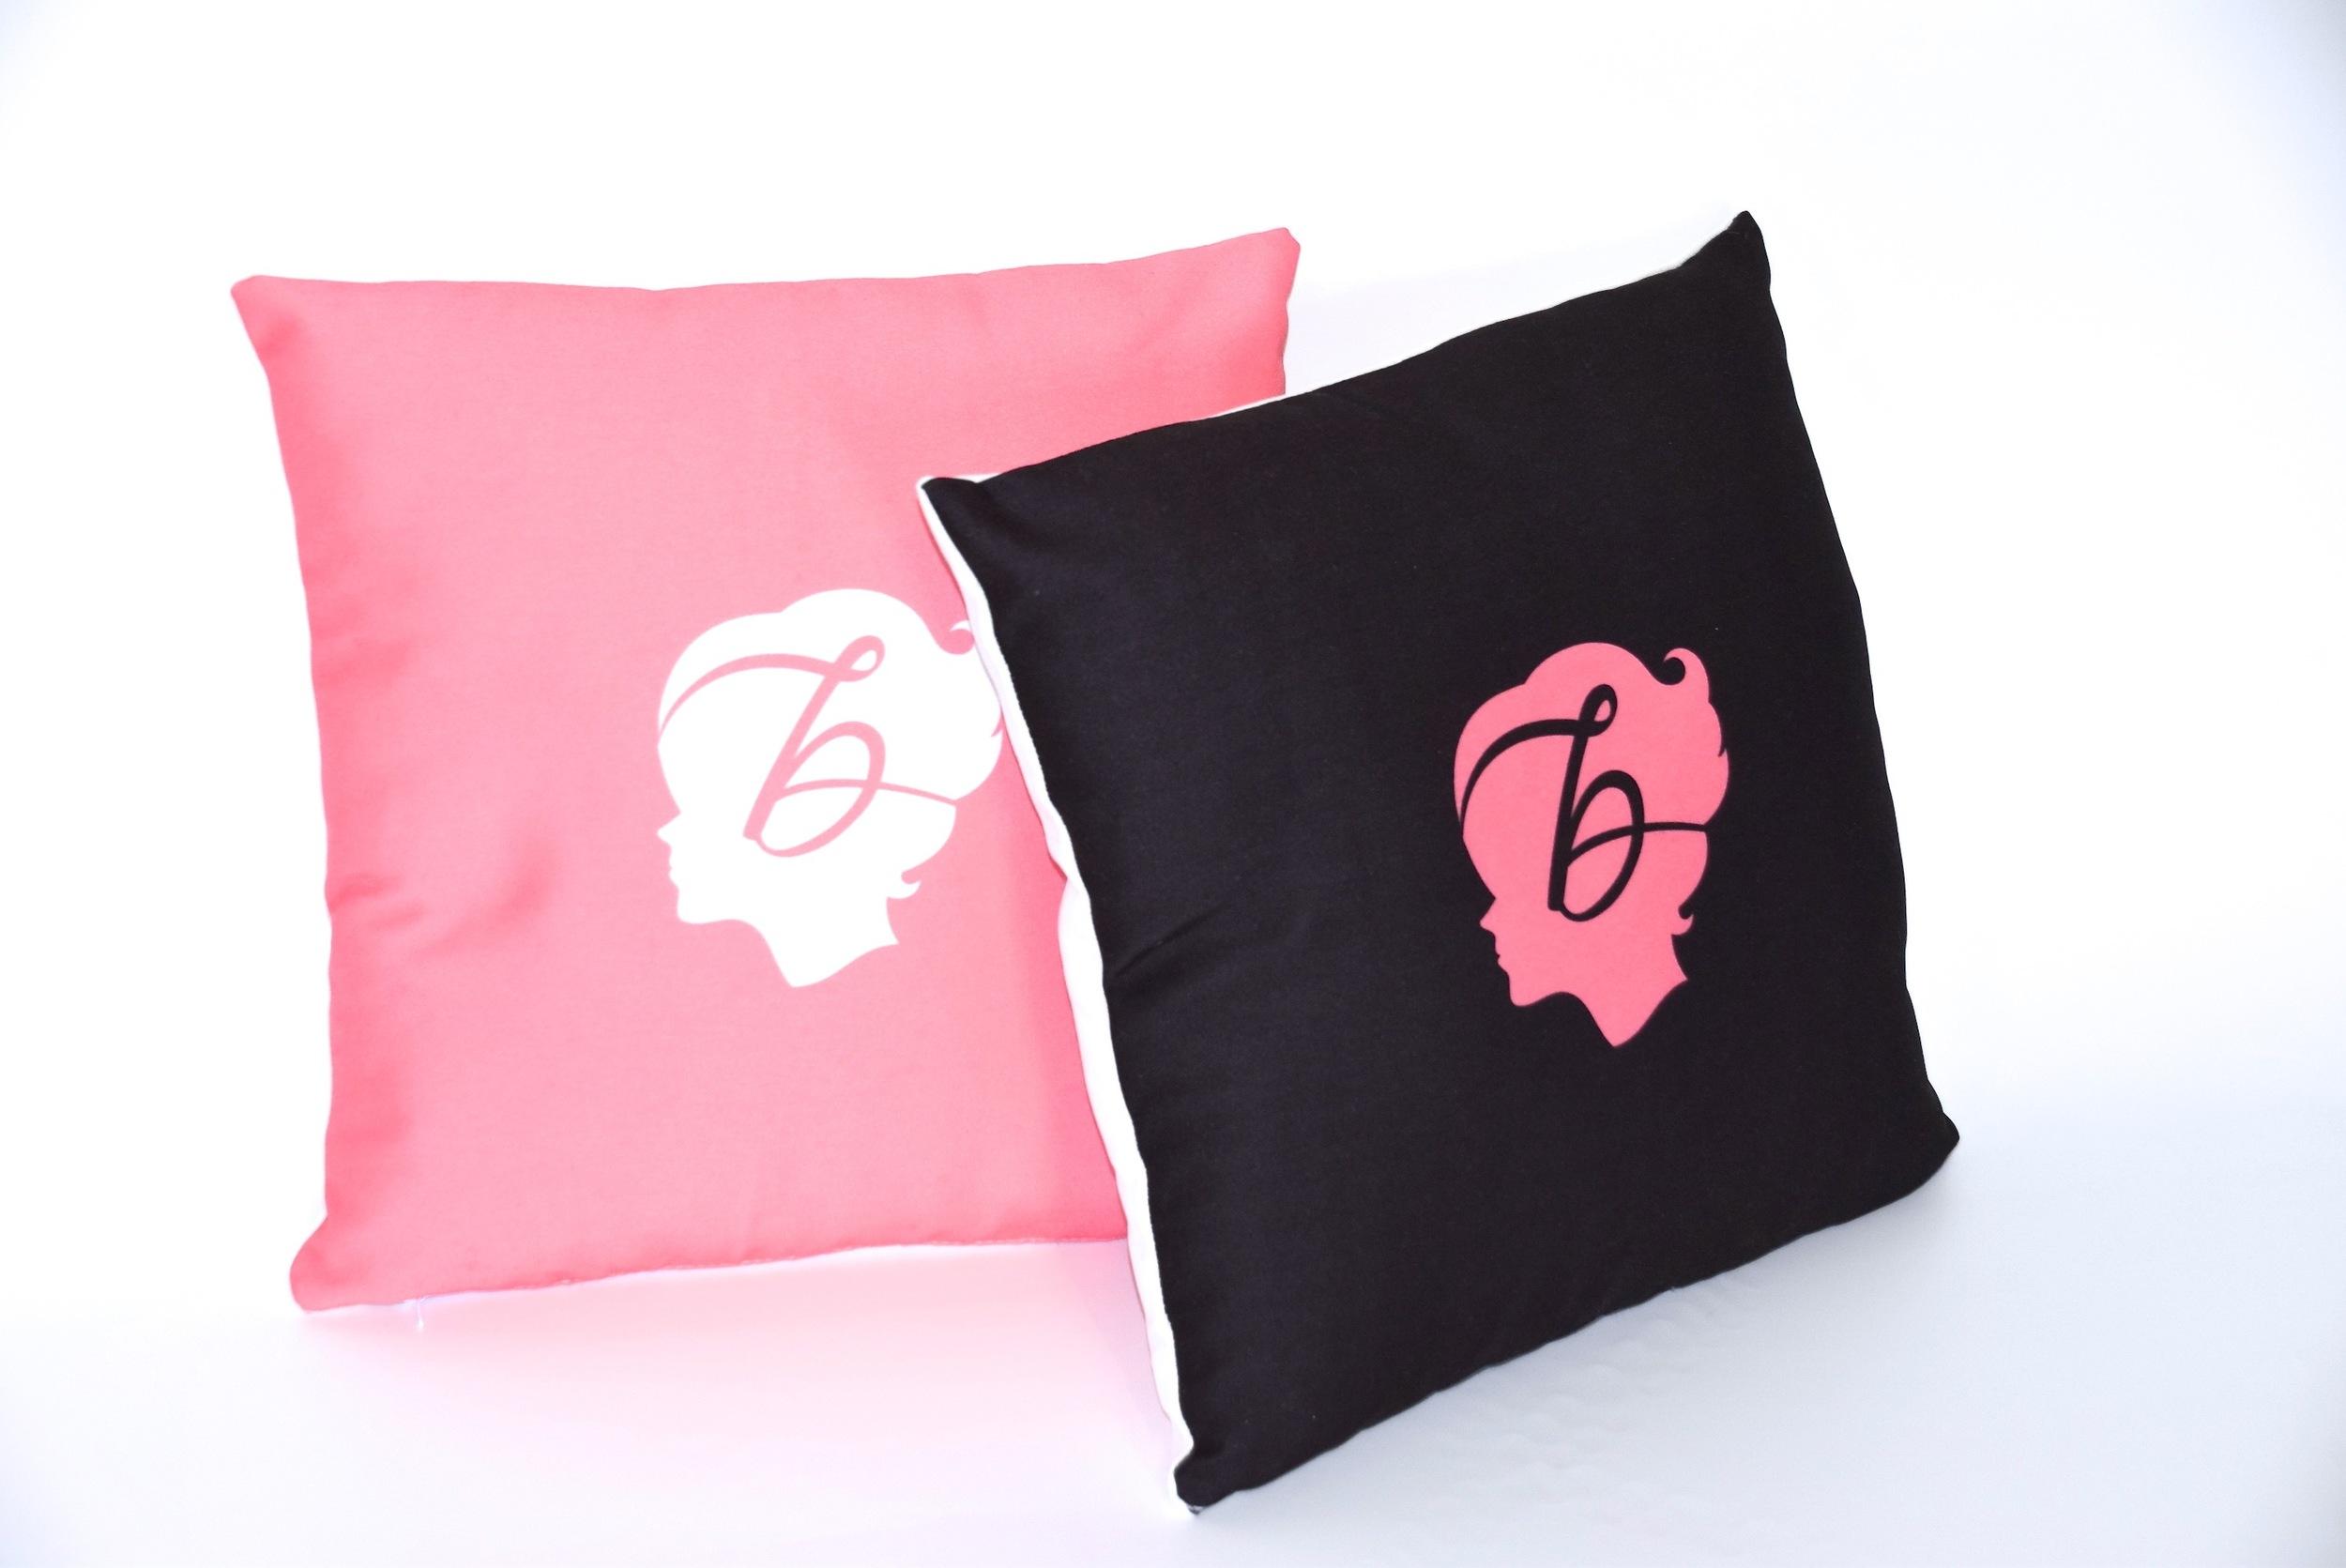 Benefit Pillows